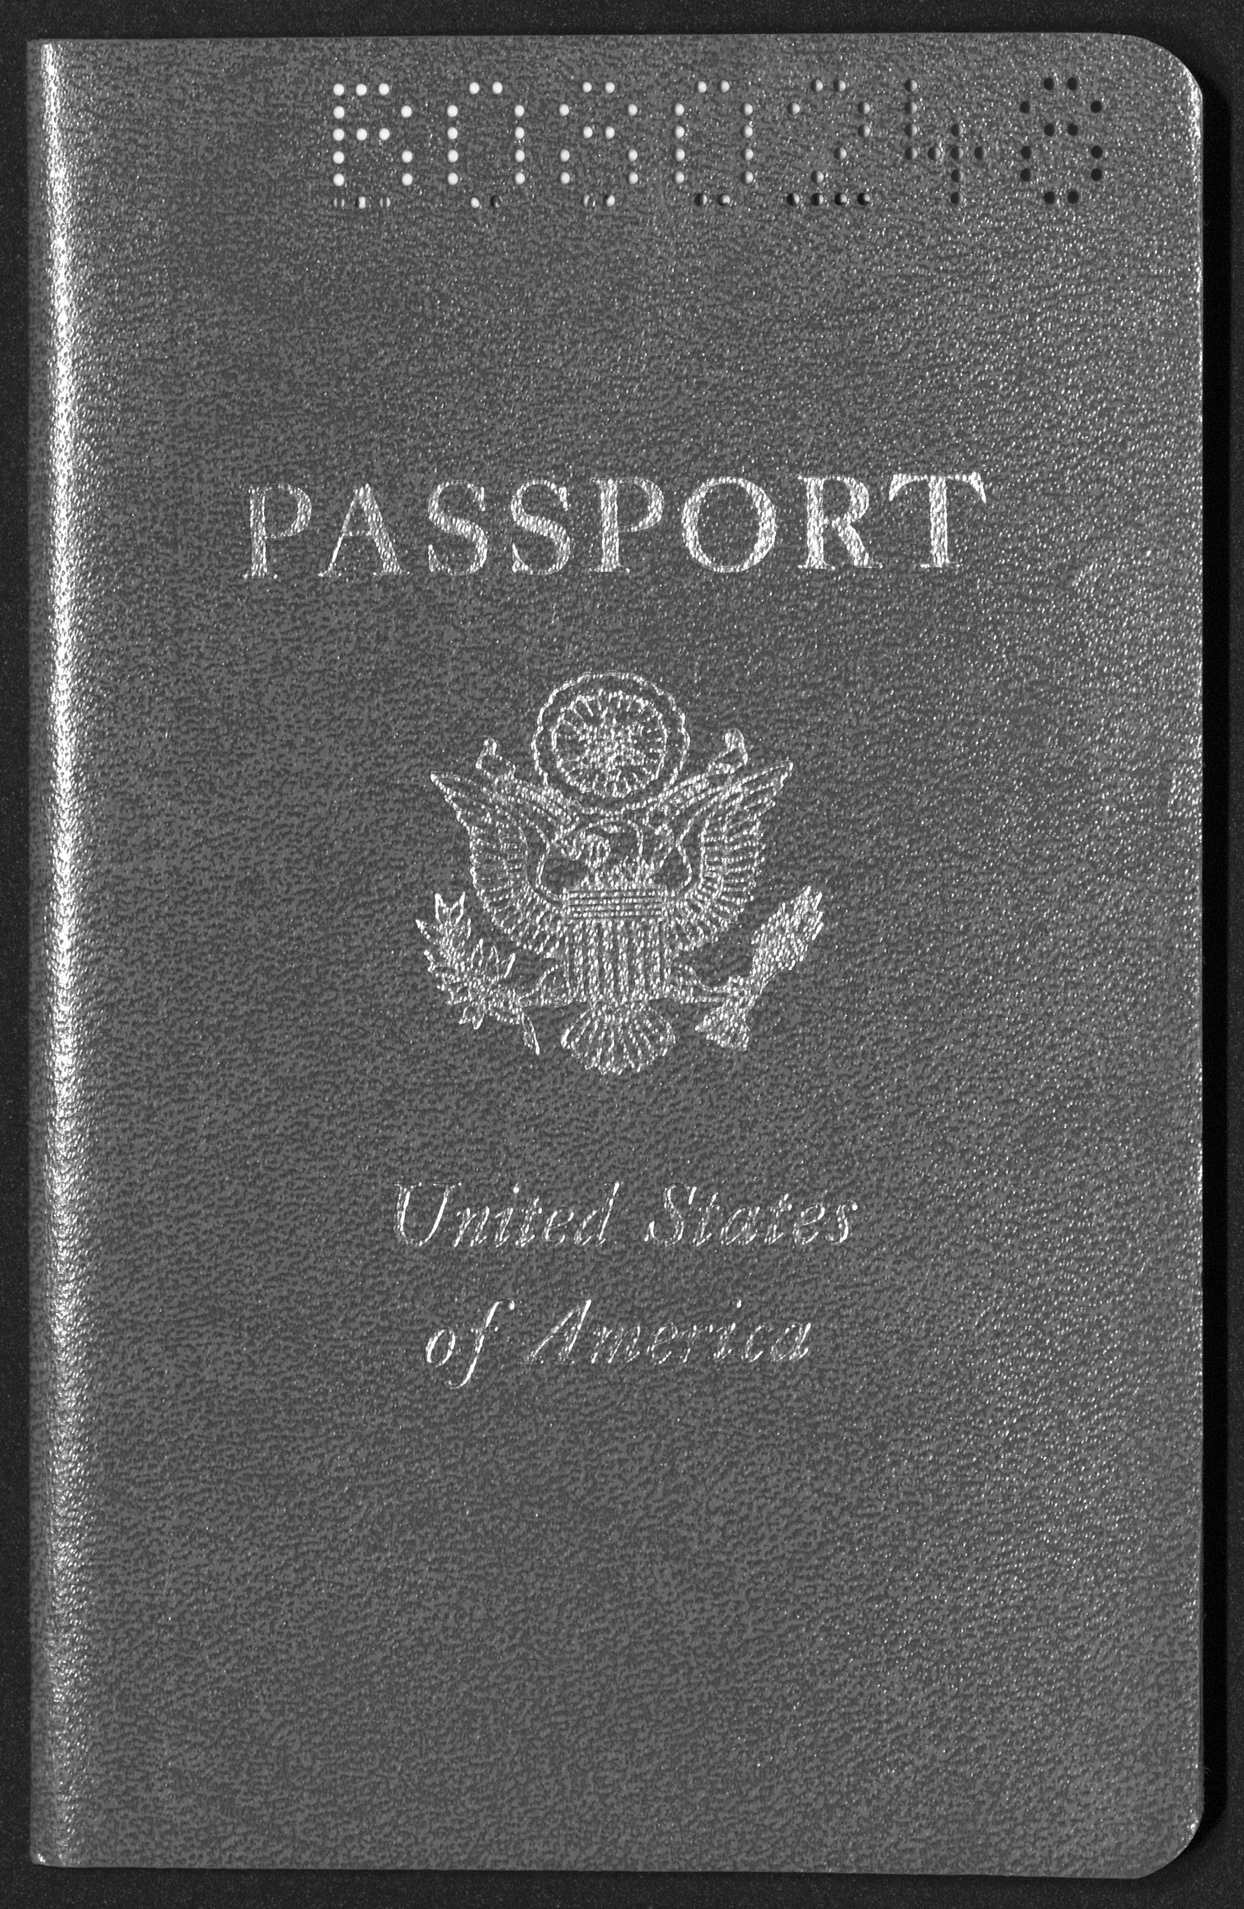 Passport, May 22, 1961, 1961 May 22, Willis J. King papers